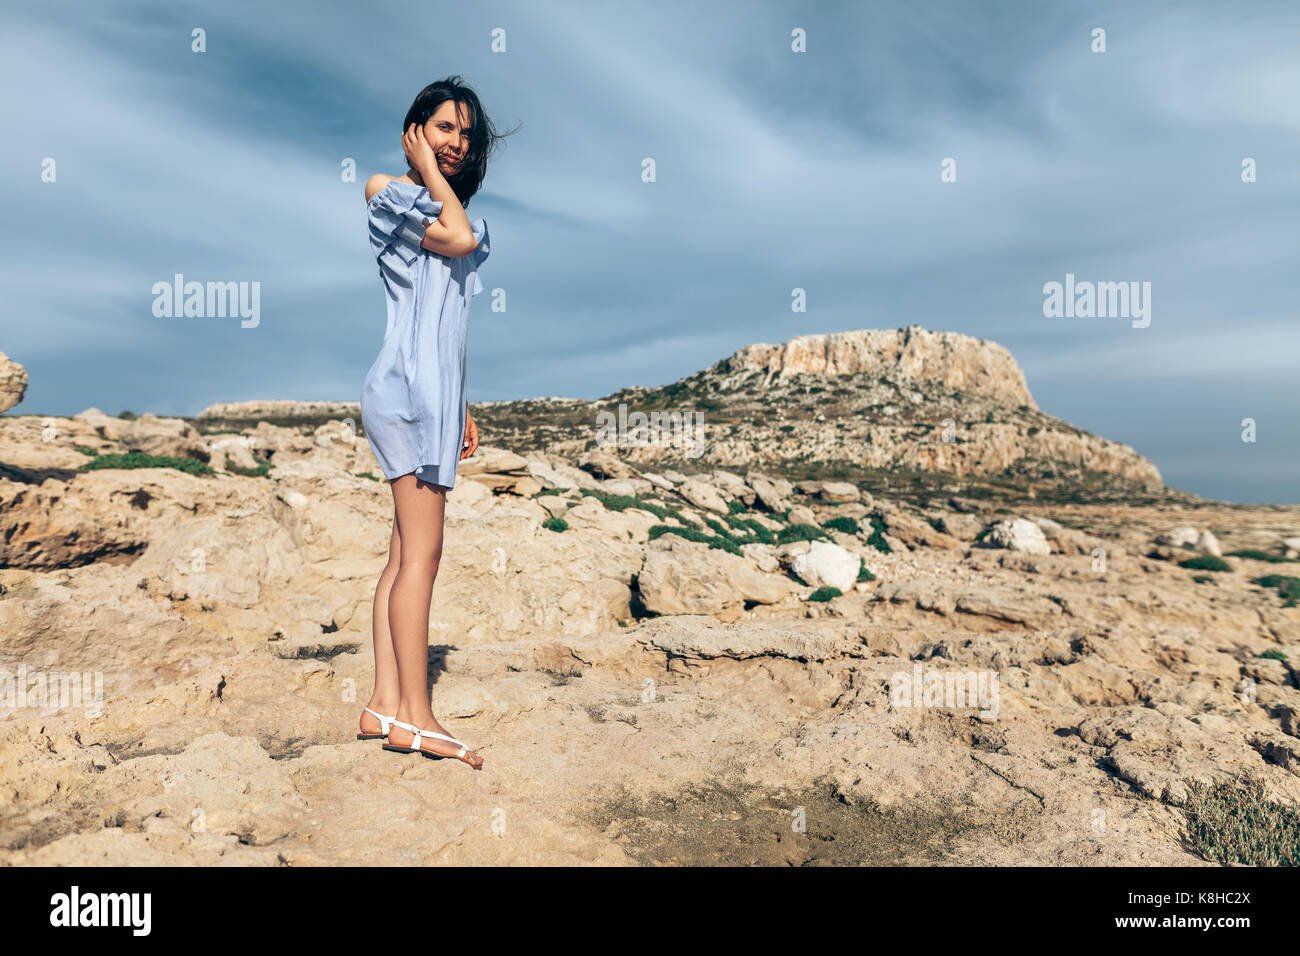 Beautiful woman standing on rocky desert with dramatic sky. Fashion - Stock Image